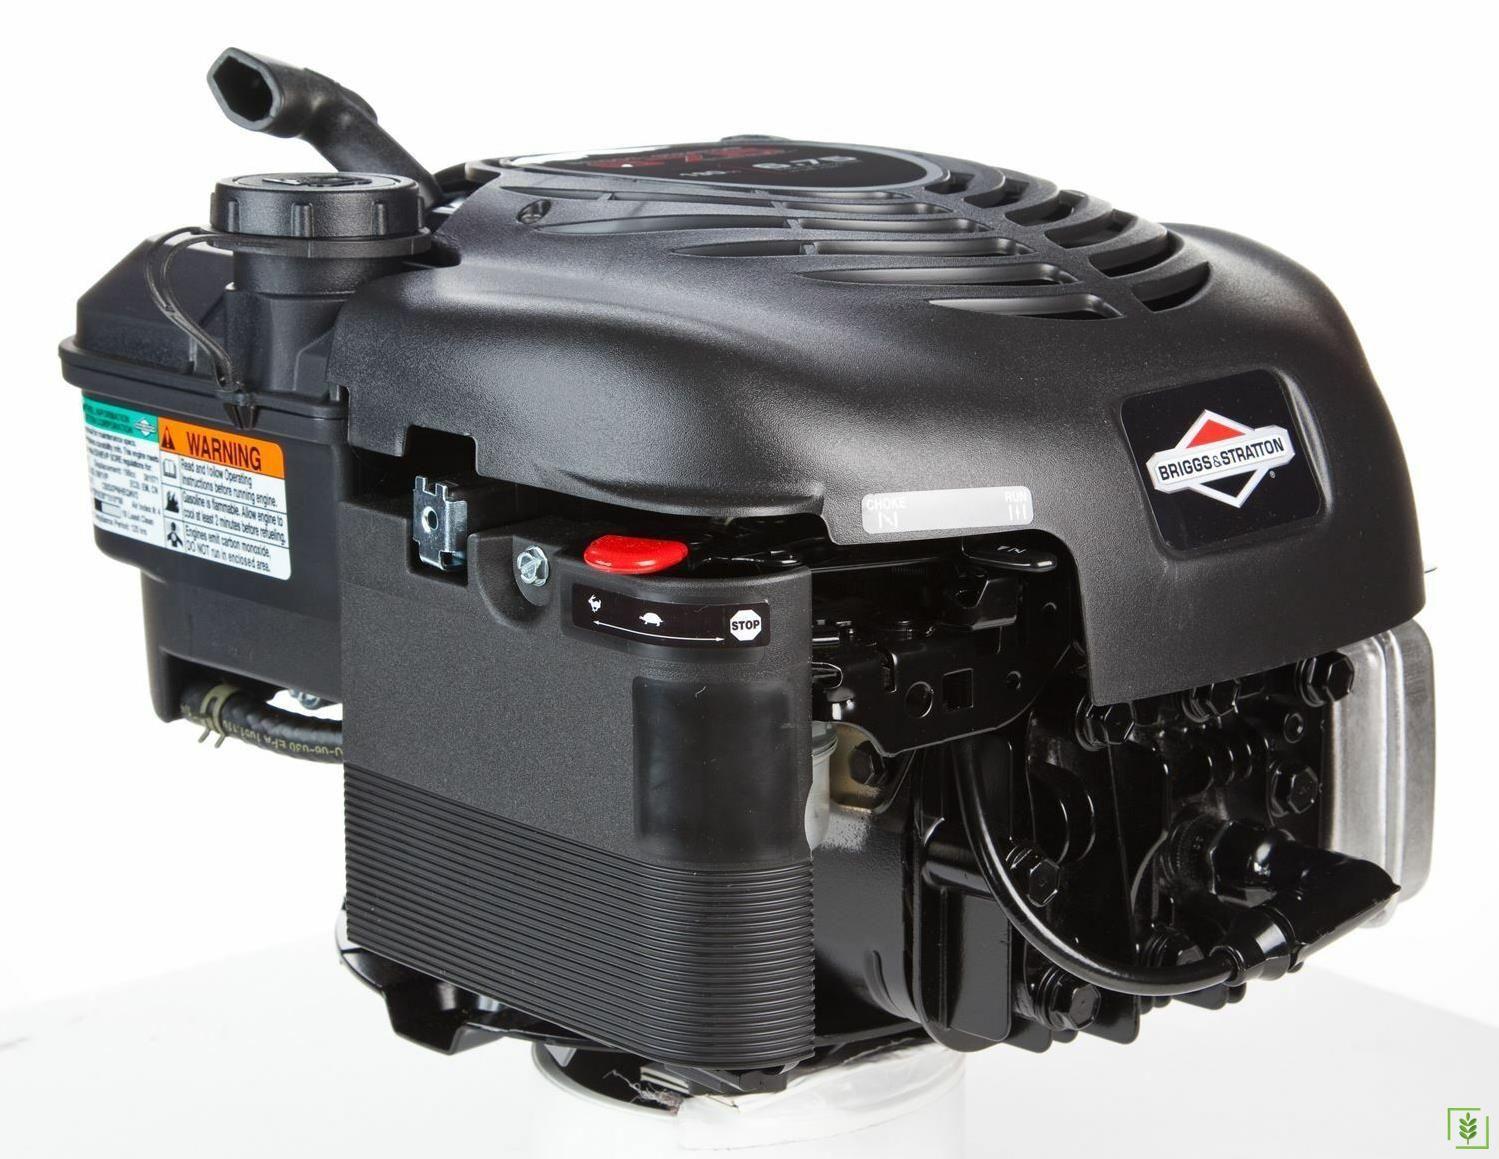 Briggs & Stratton 6.75 Quantum Çim Biçme Motoru 190 cc